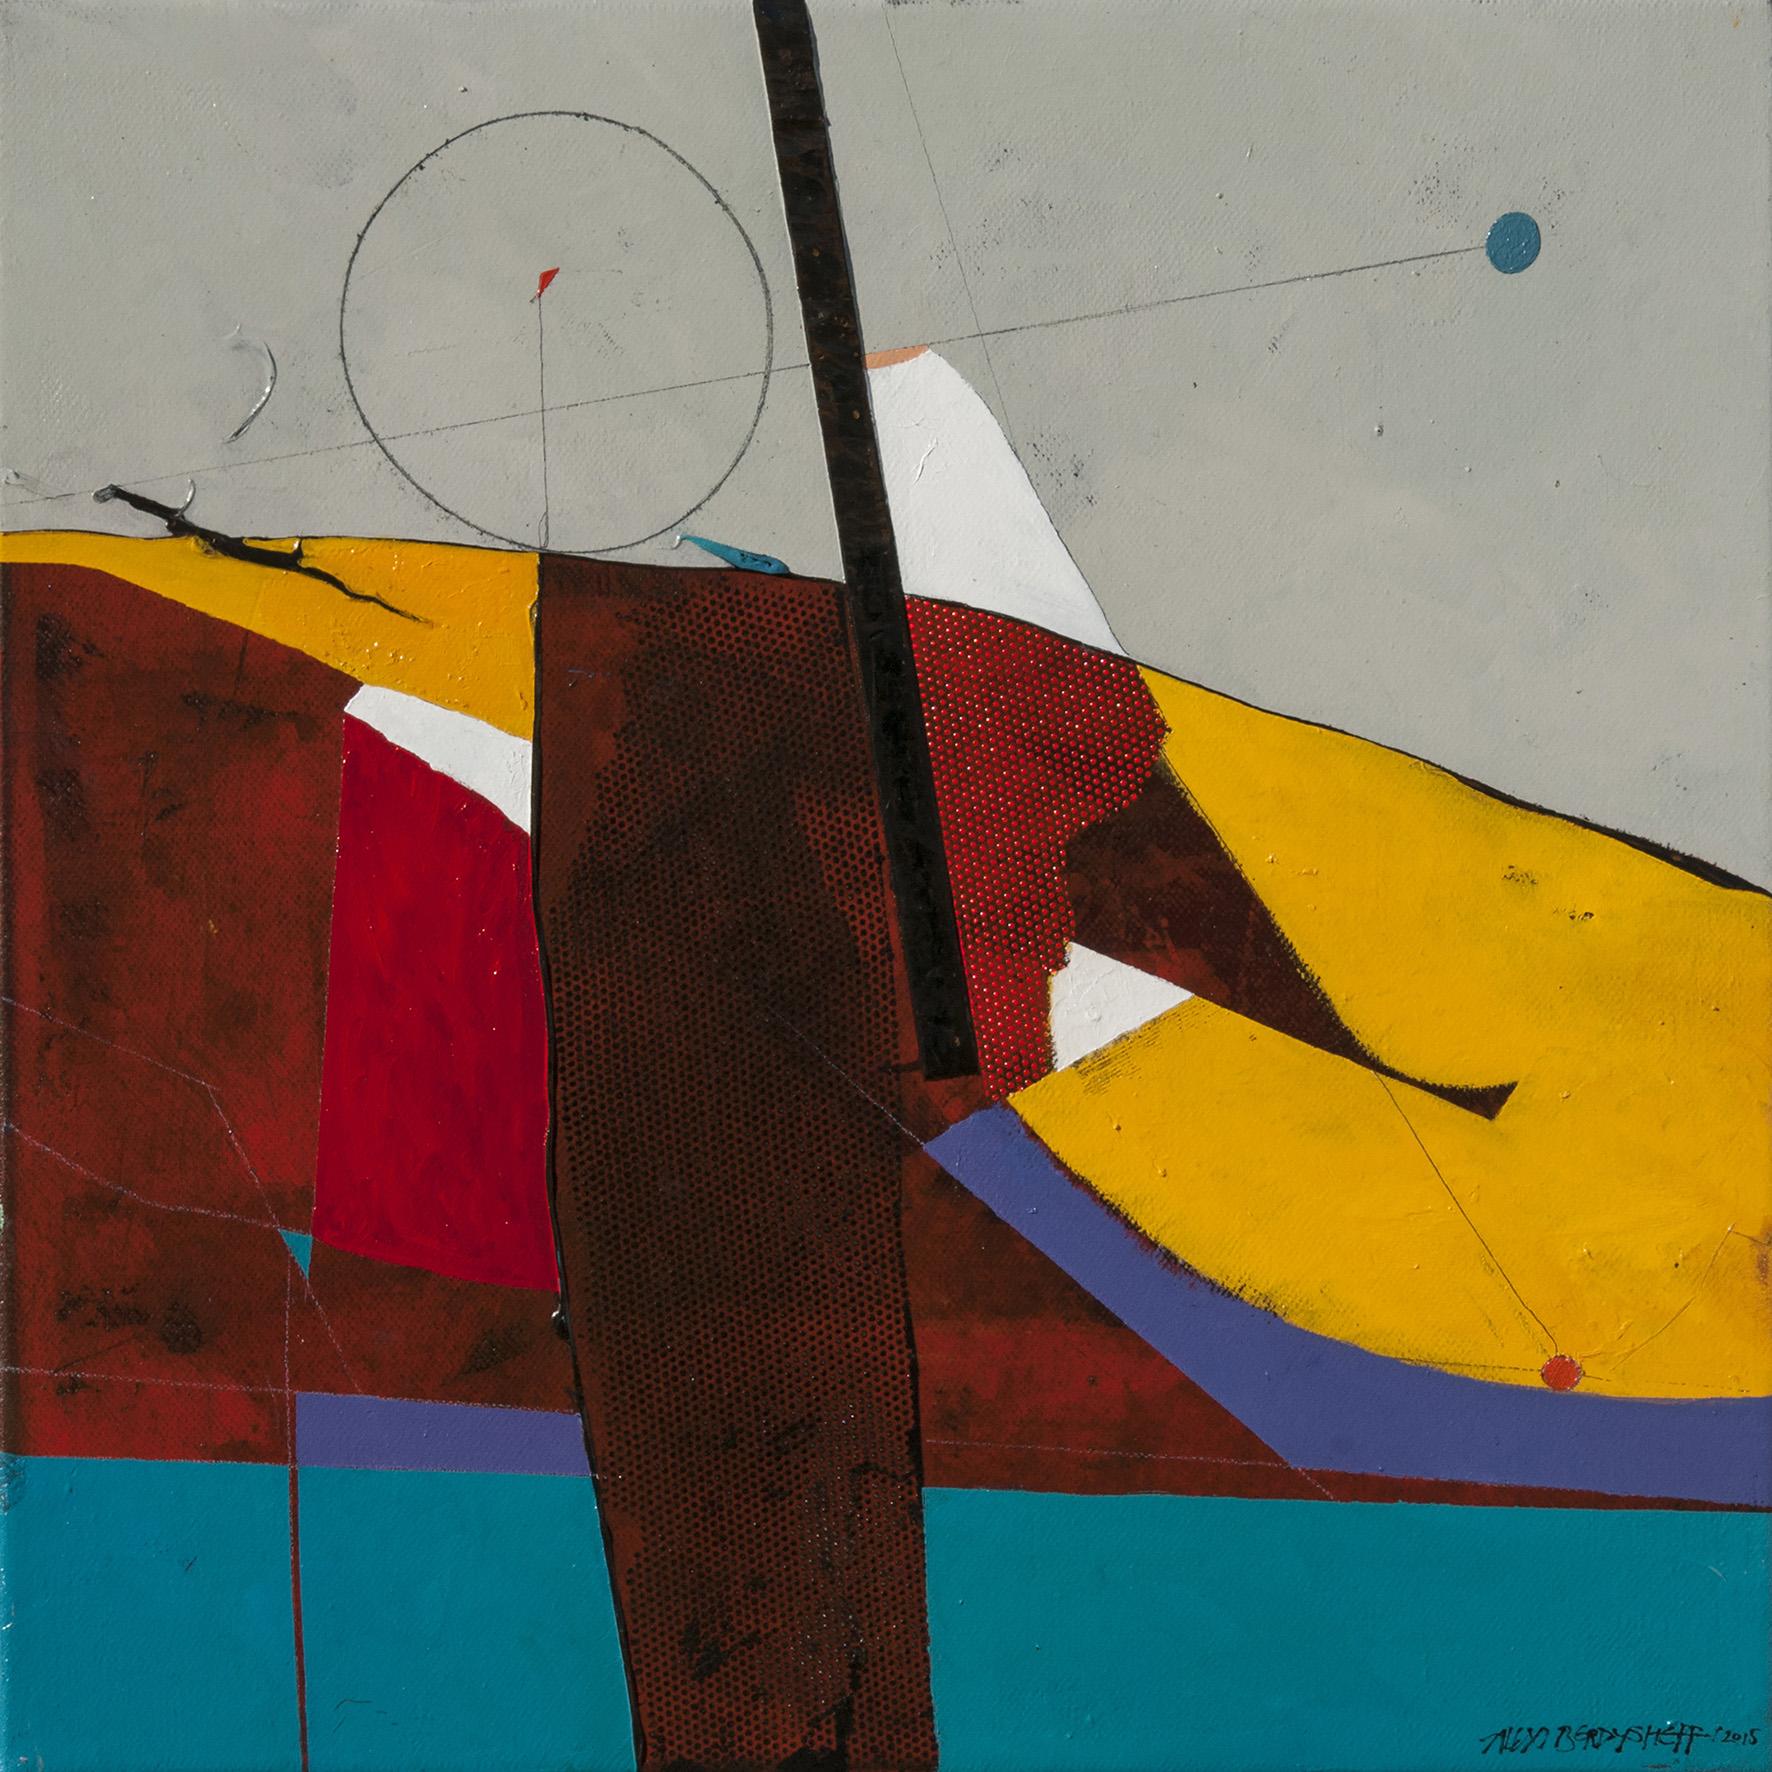 Rhythm VIII, oil on canvas, 46x46 cm, 2015